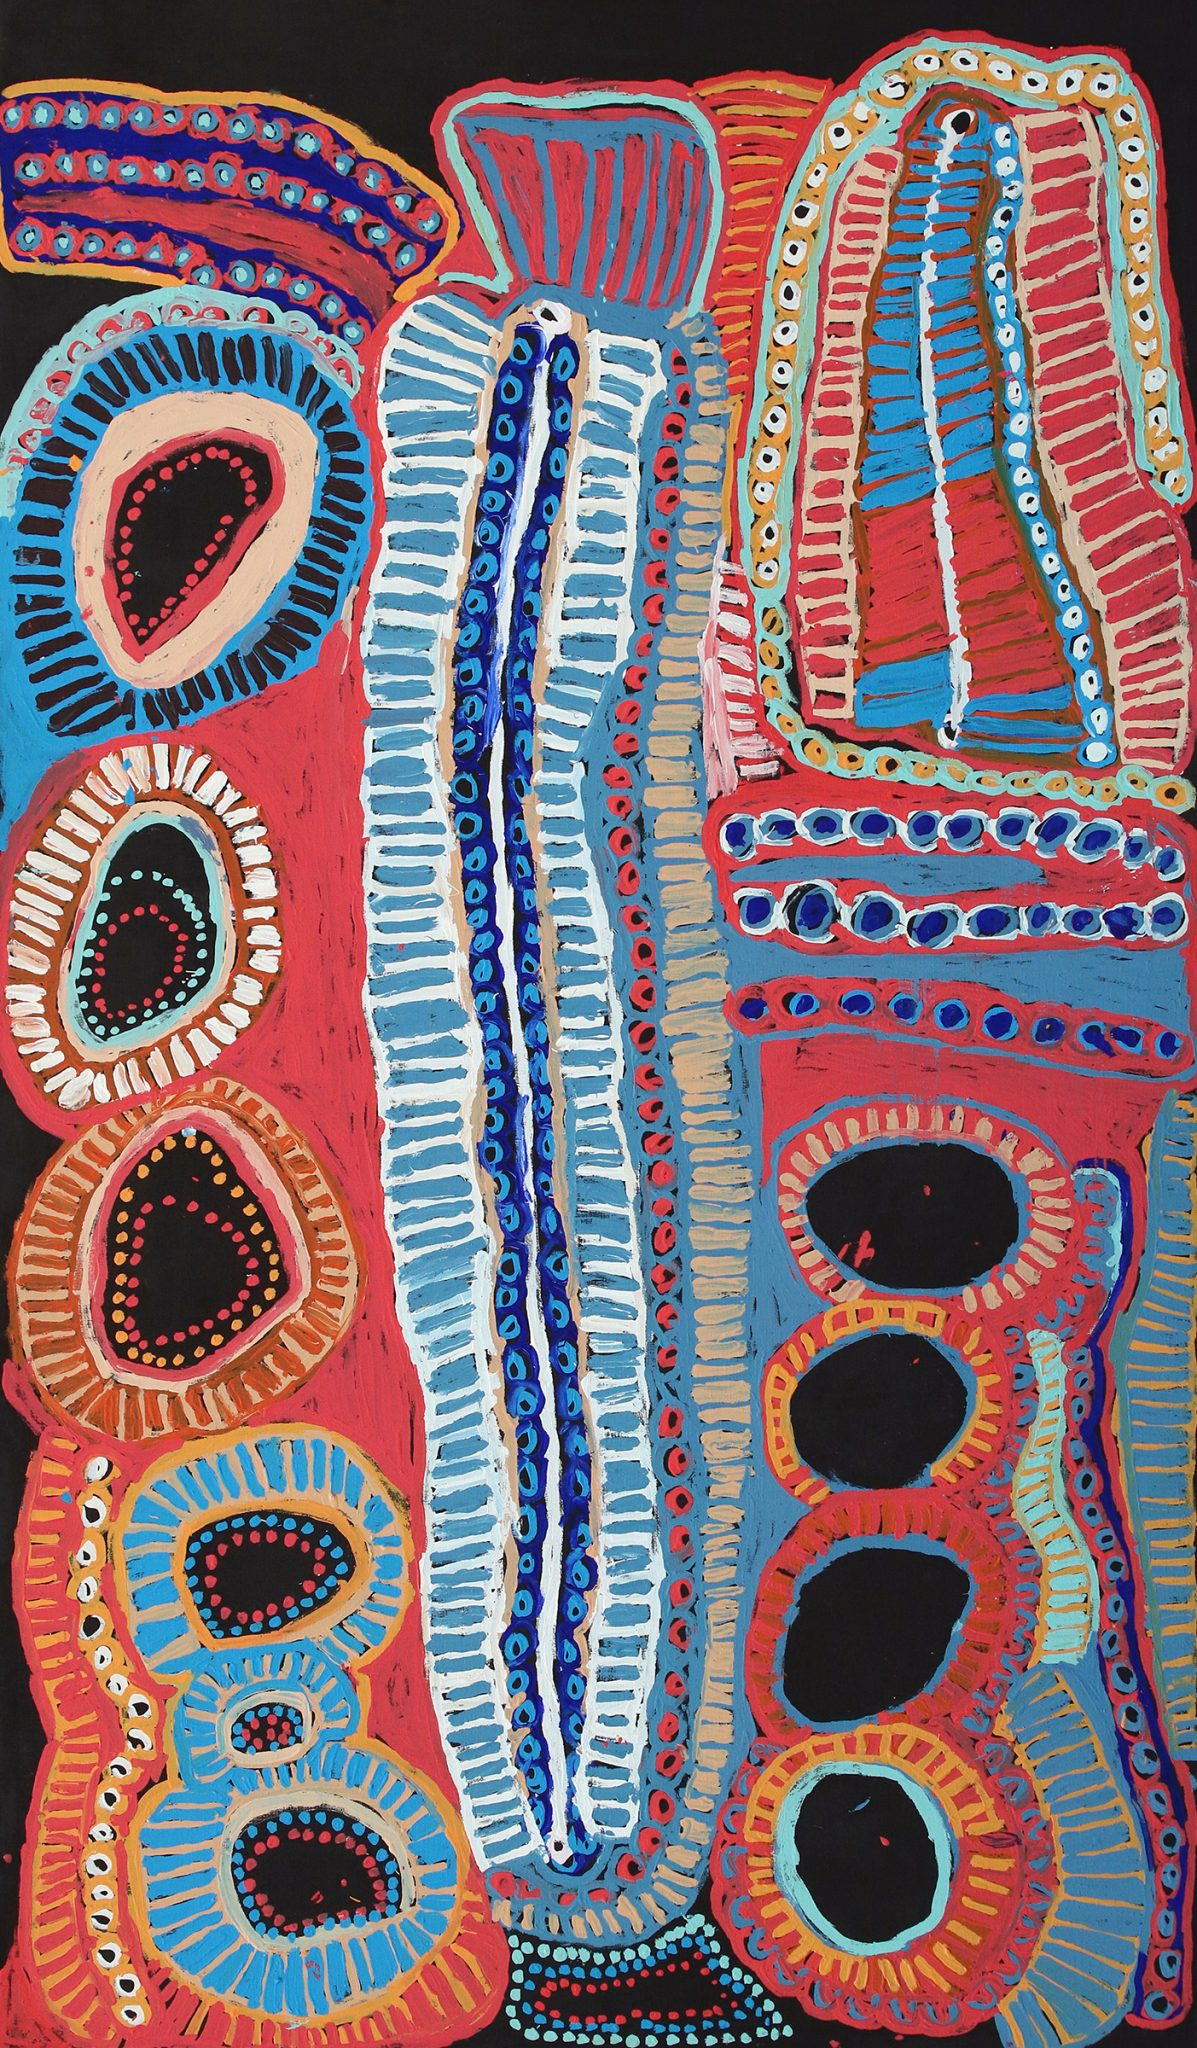 Malikijarra Jukurrpa (Two Dogs Dreaming) by Murdie Nampijinpa Morris